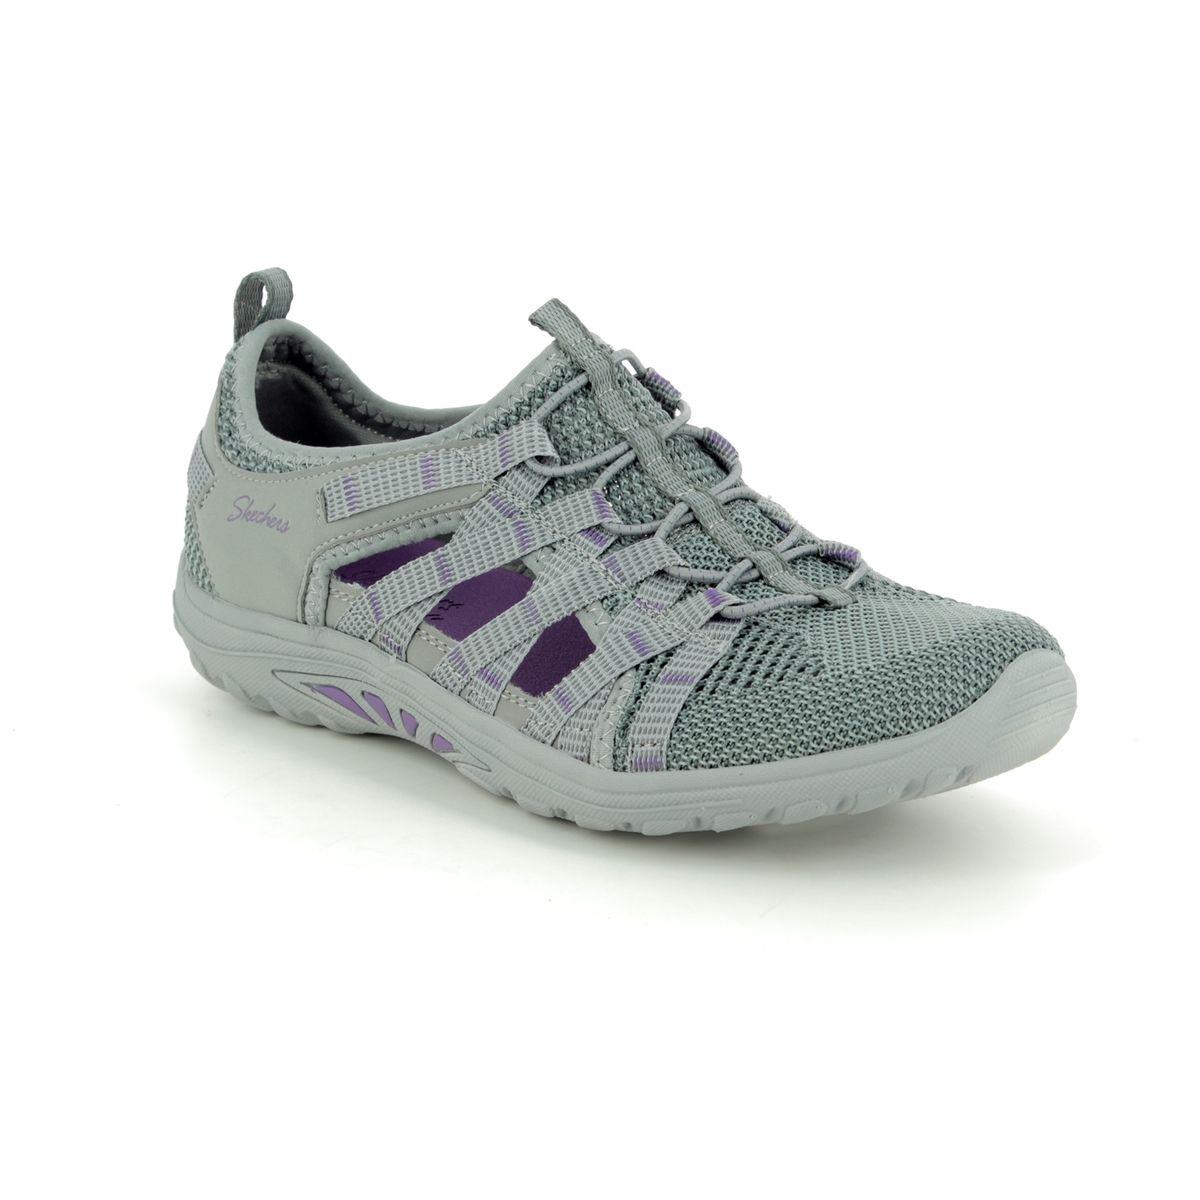 124debaf Skechers Closed Toe Sandals - Grey - 49589 REGGAE FEST